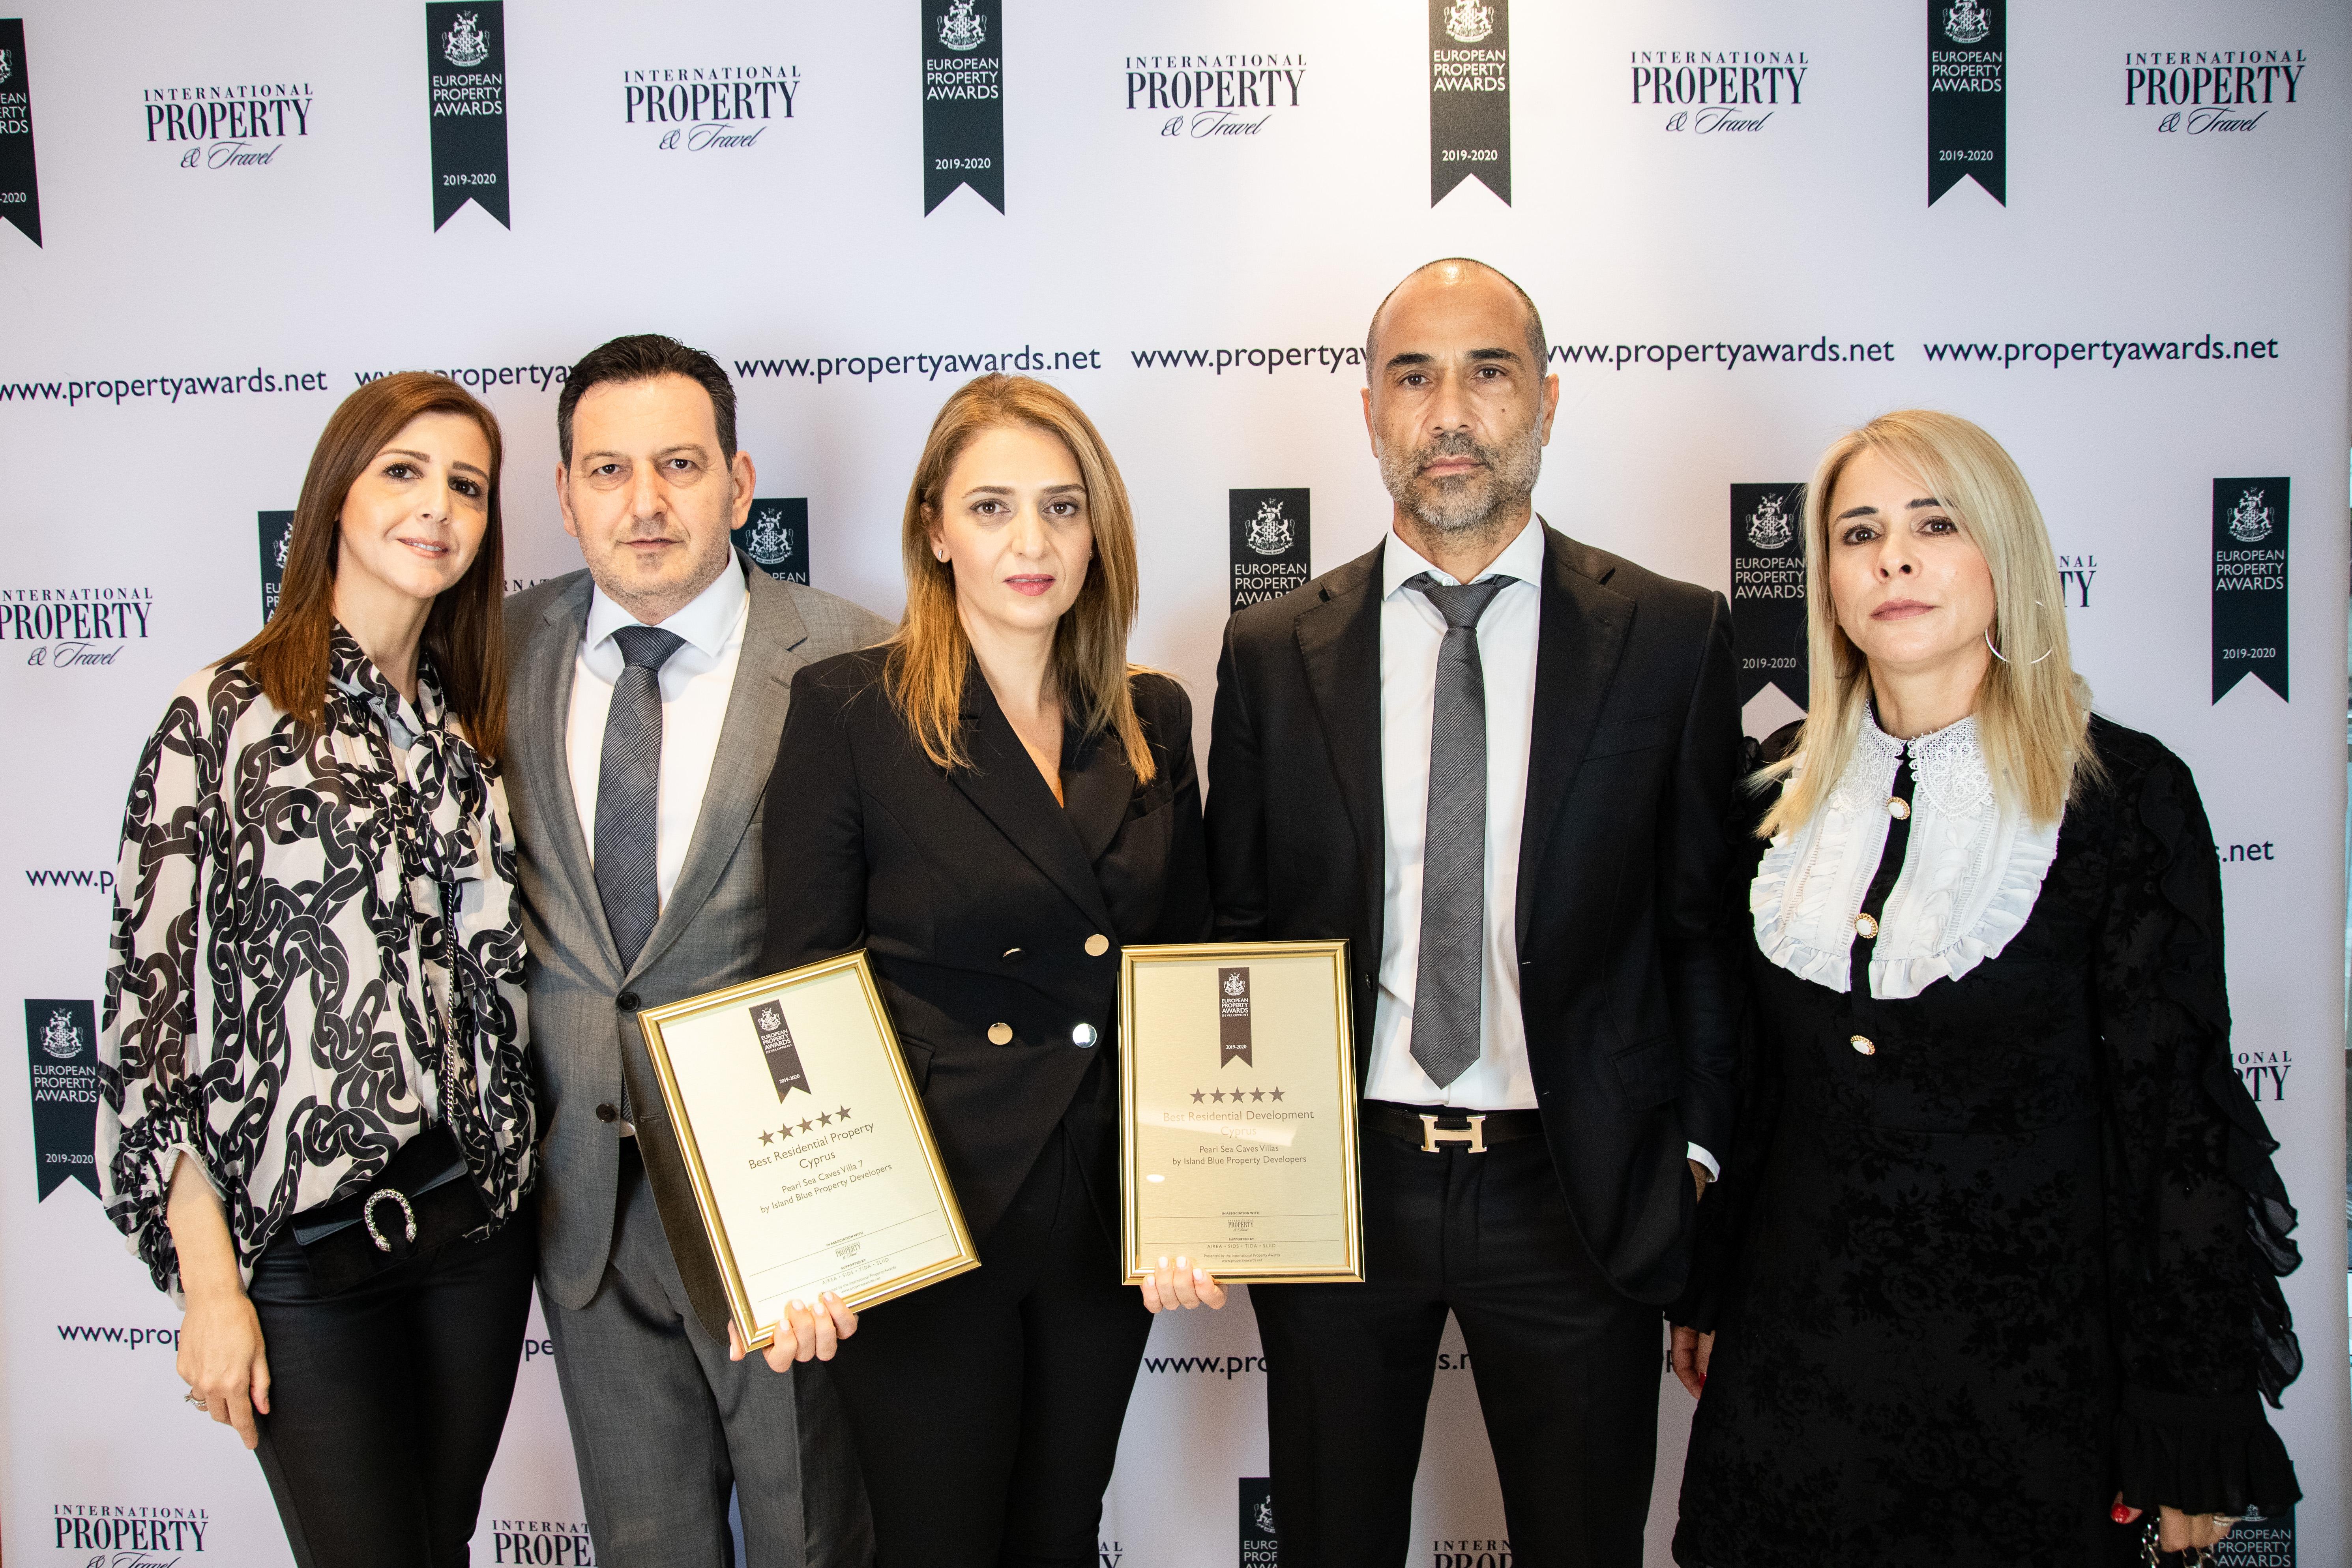 European Property Awards